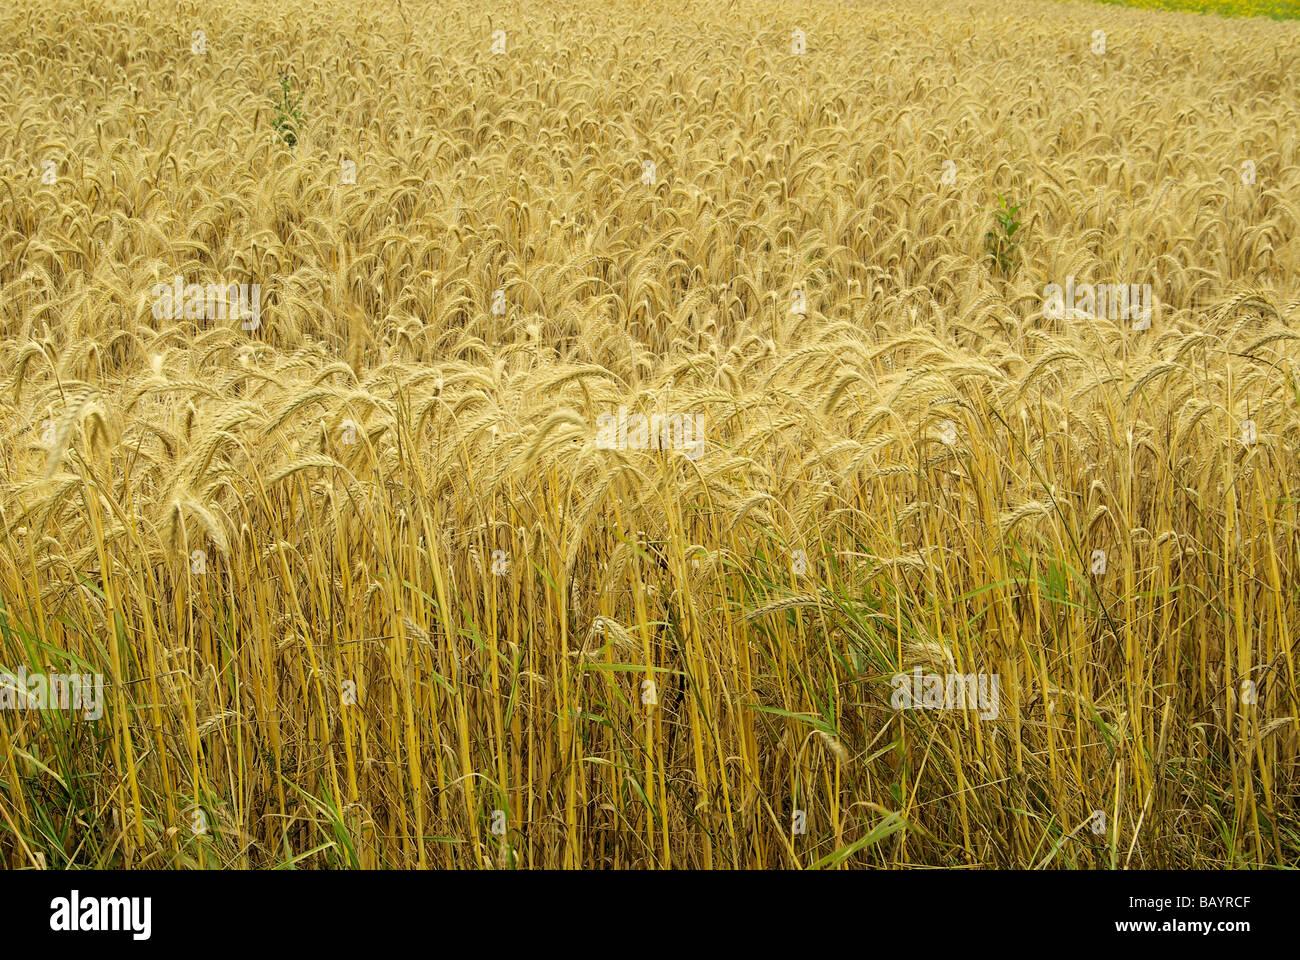 Roggenfeld rye field 02 - Stock Image